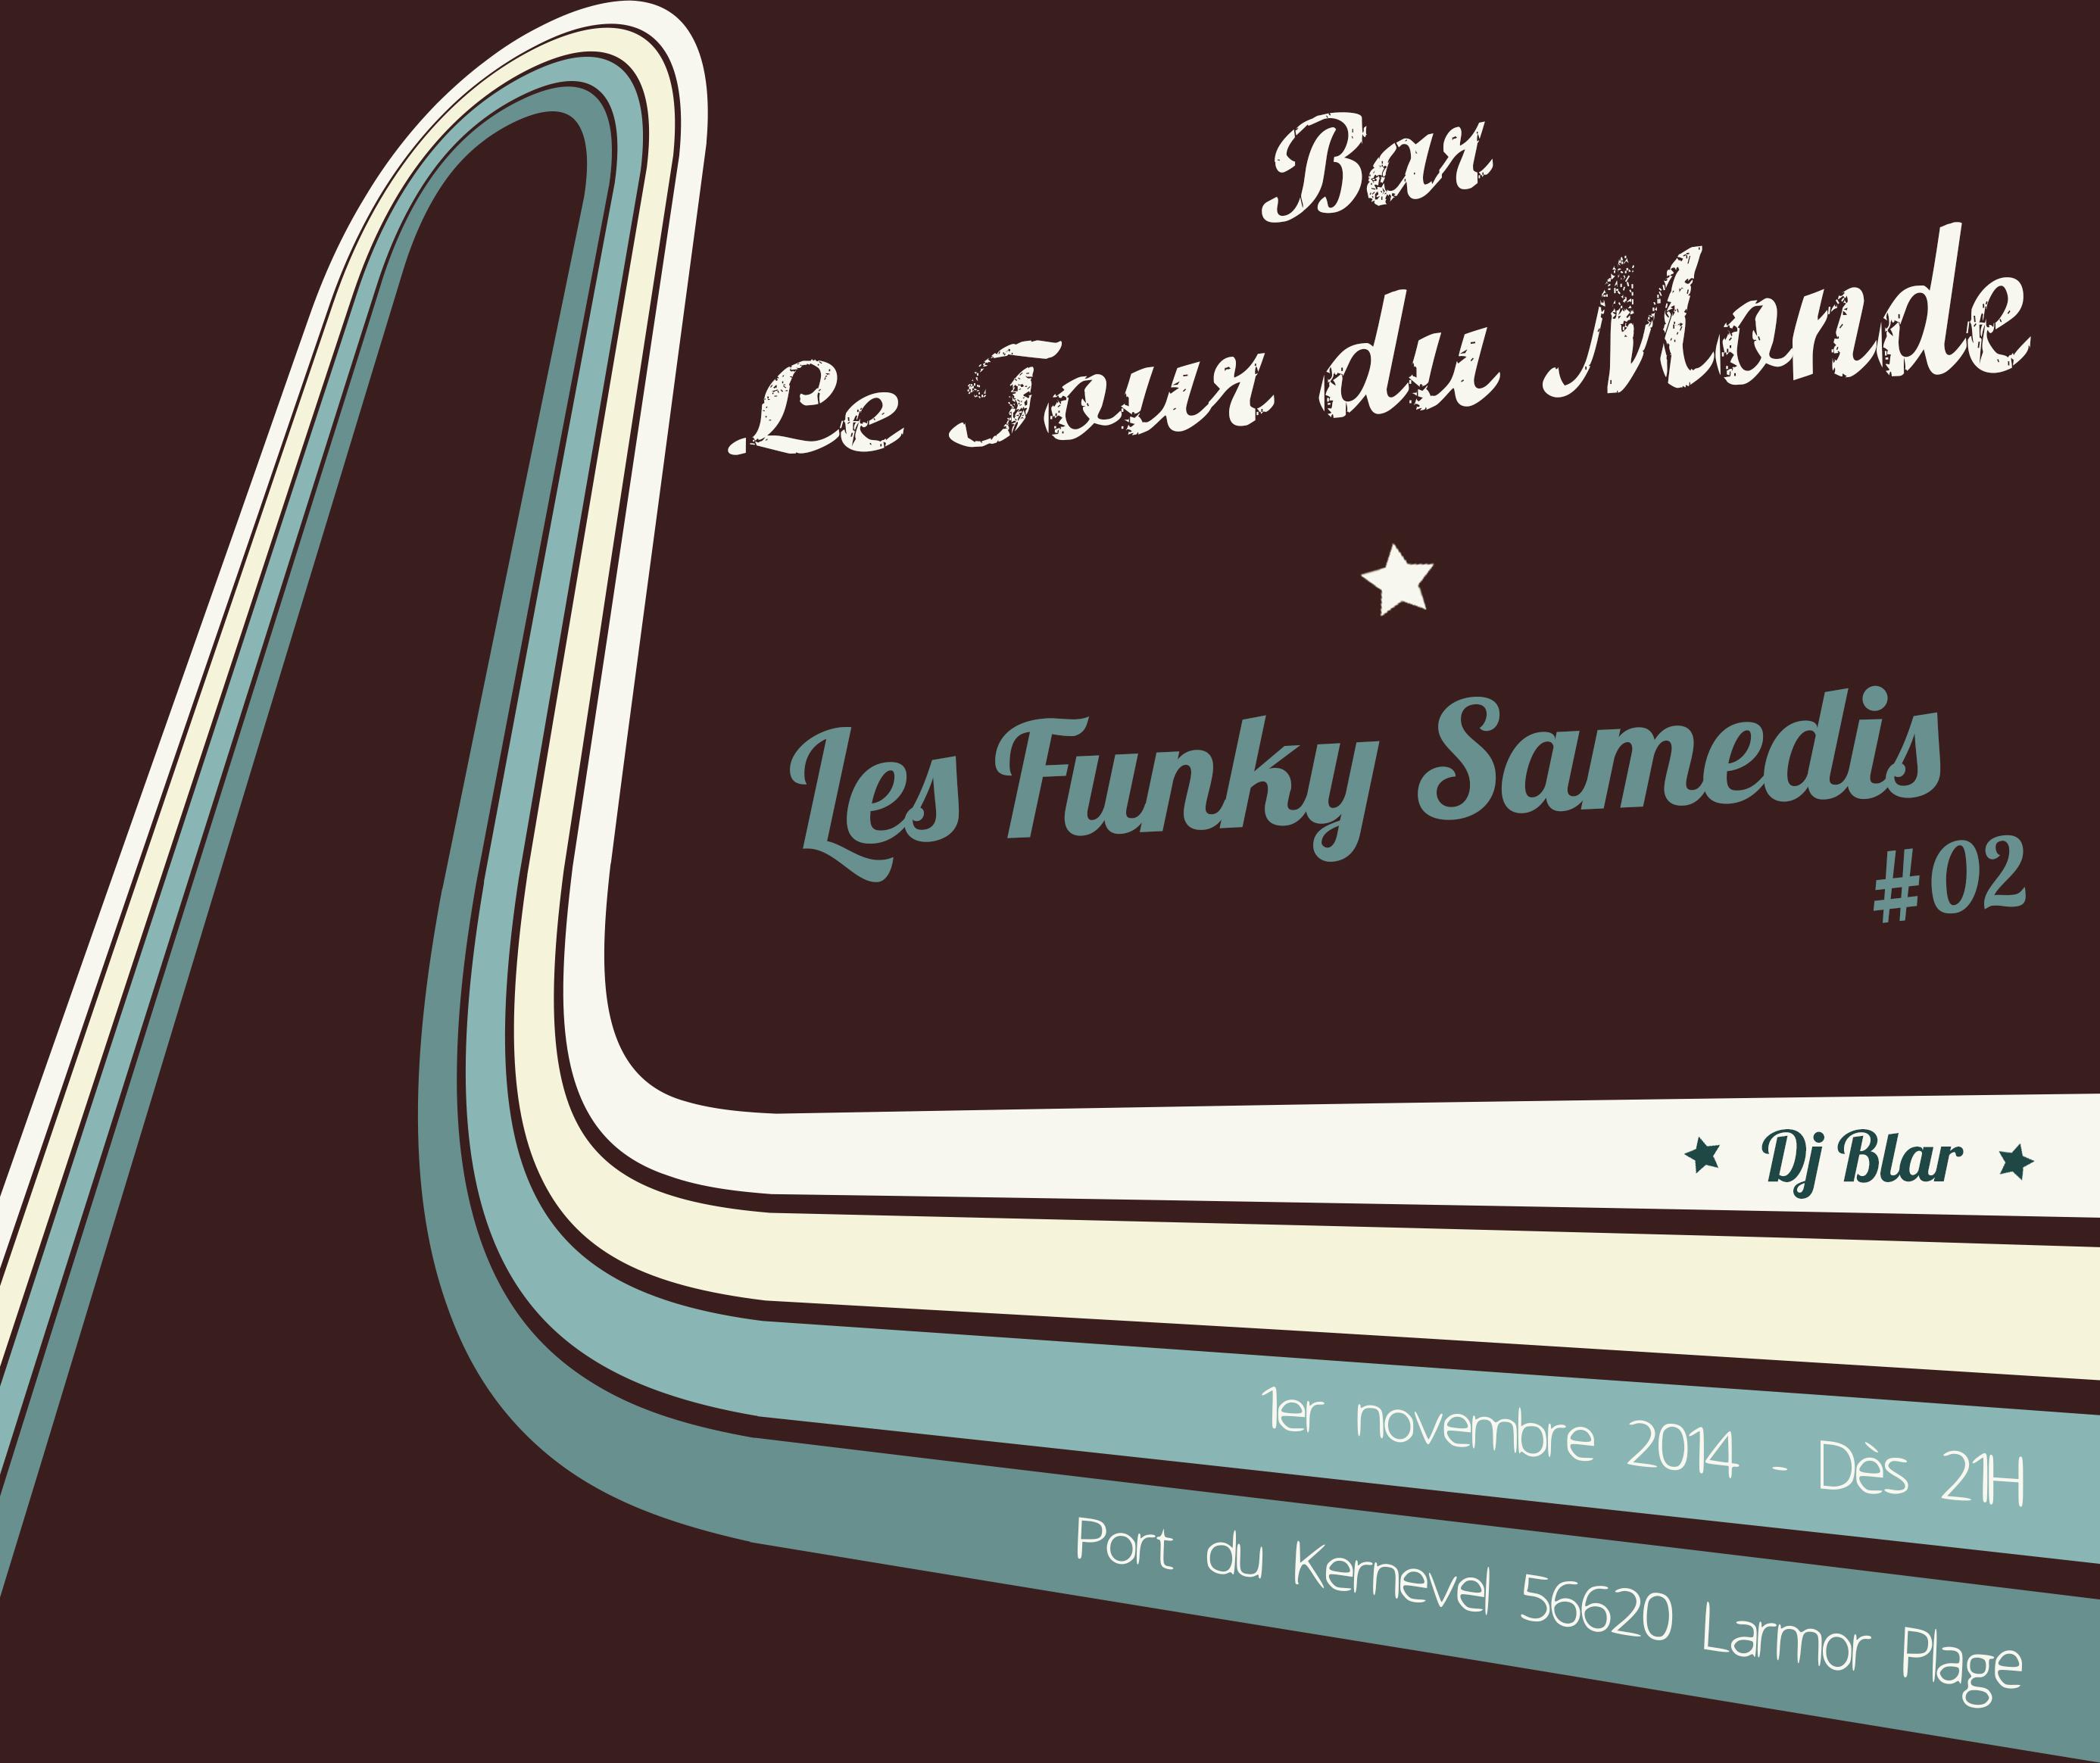 Flyer Tour Du Monde 02_Dj Blar